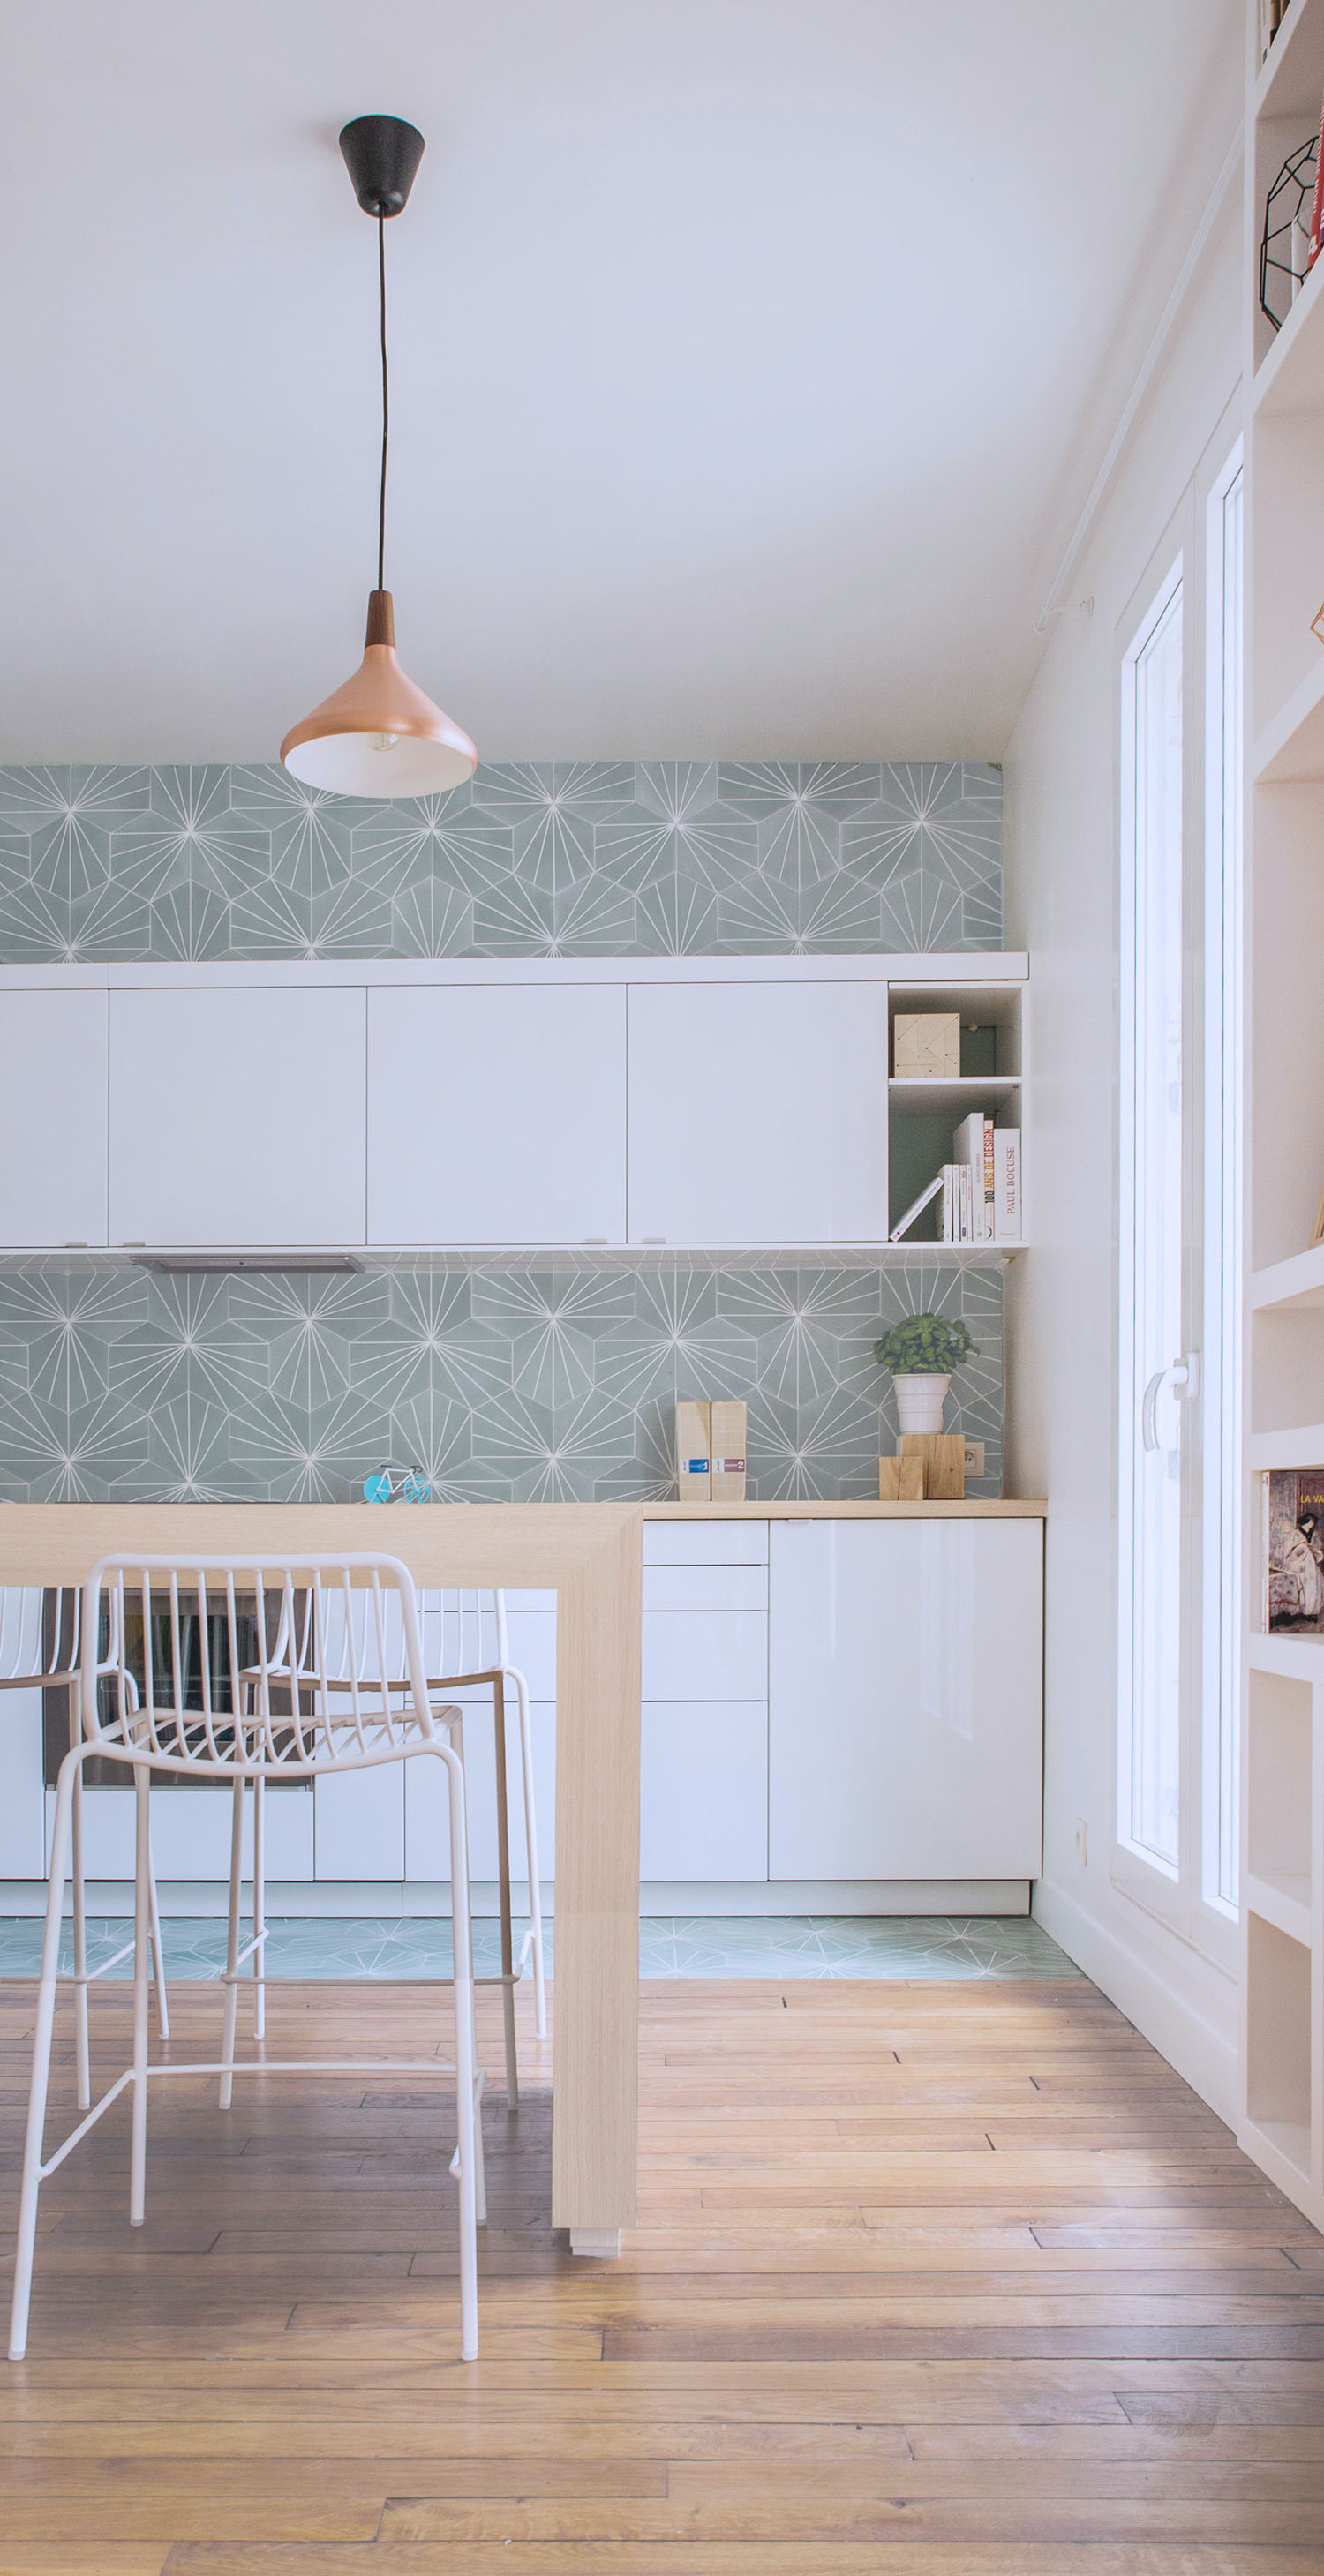 Dandelion - celadon/milk, France | Tiles | Pinterest | Dandelions ...